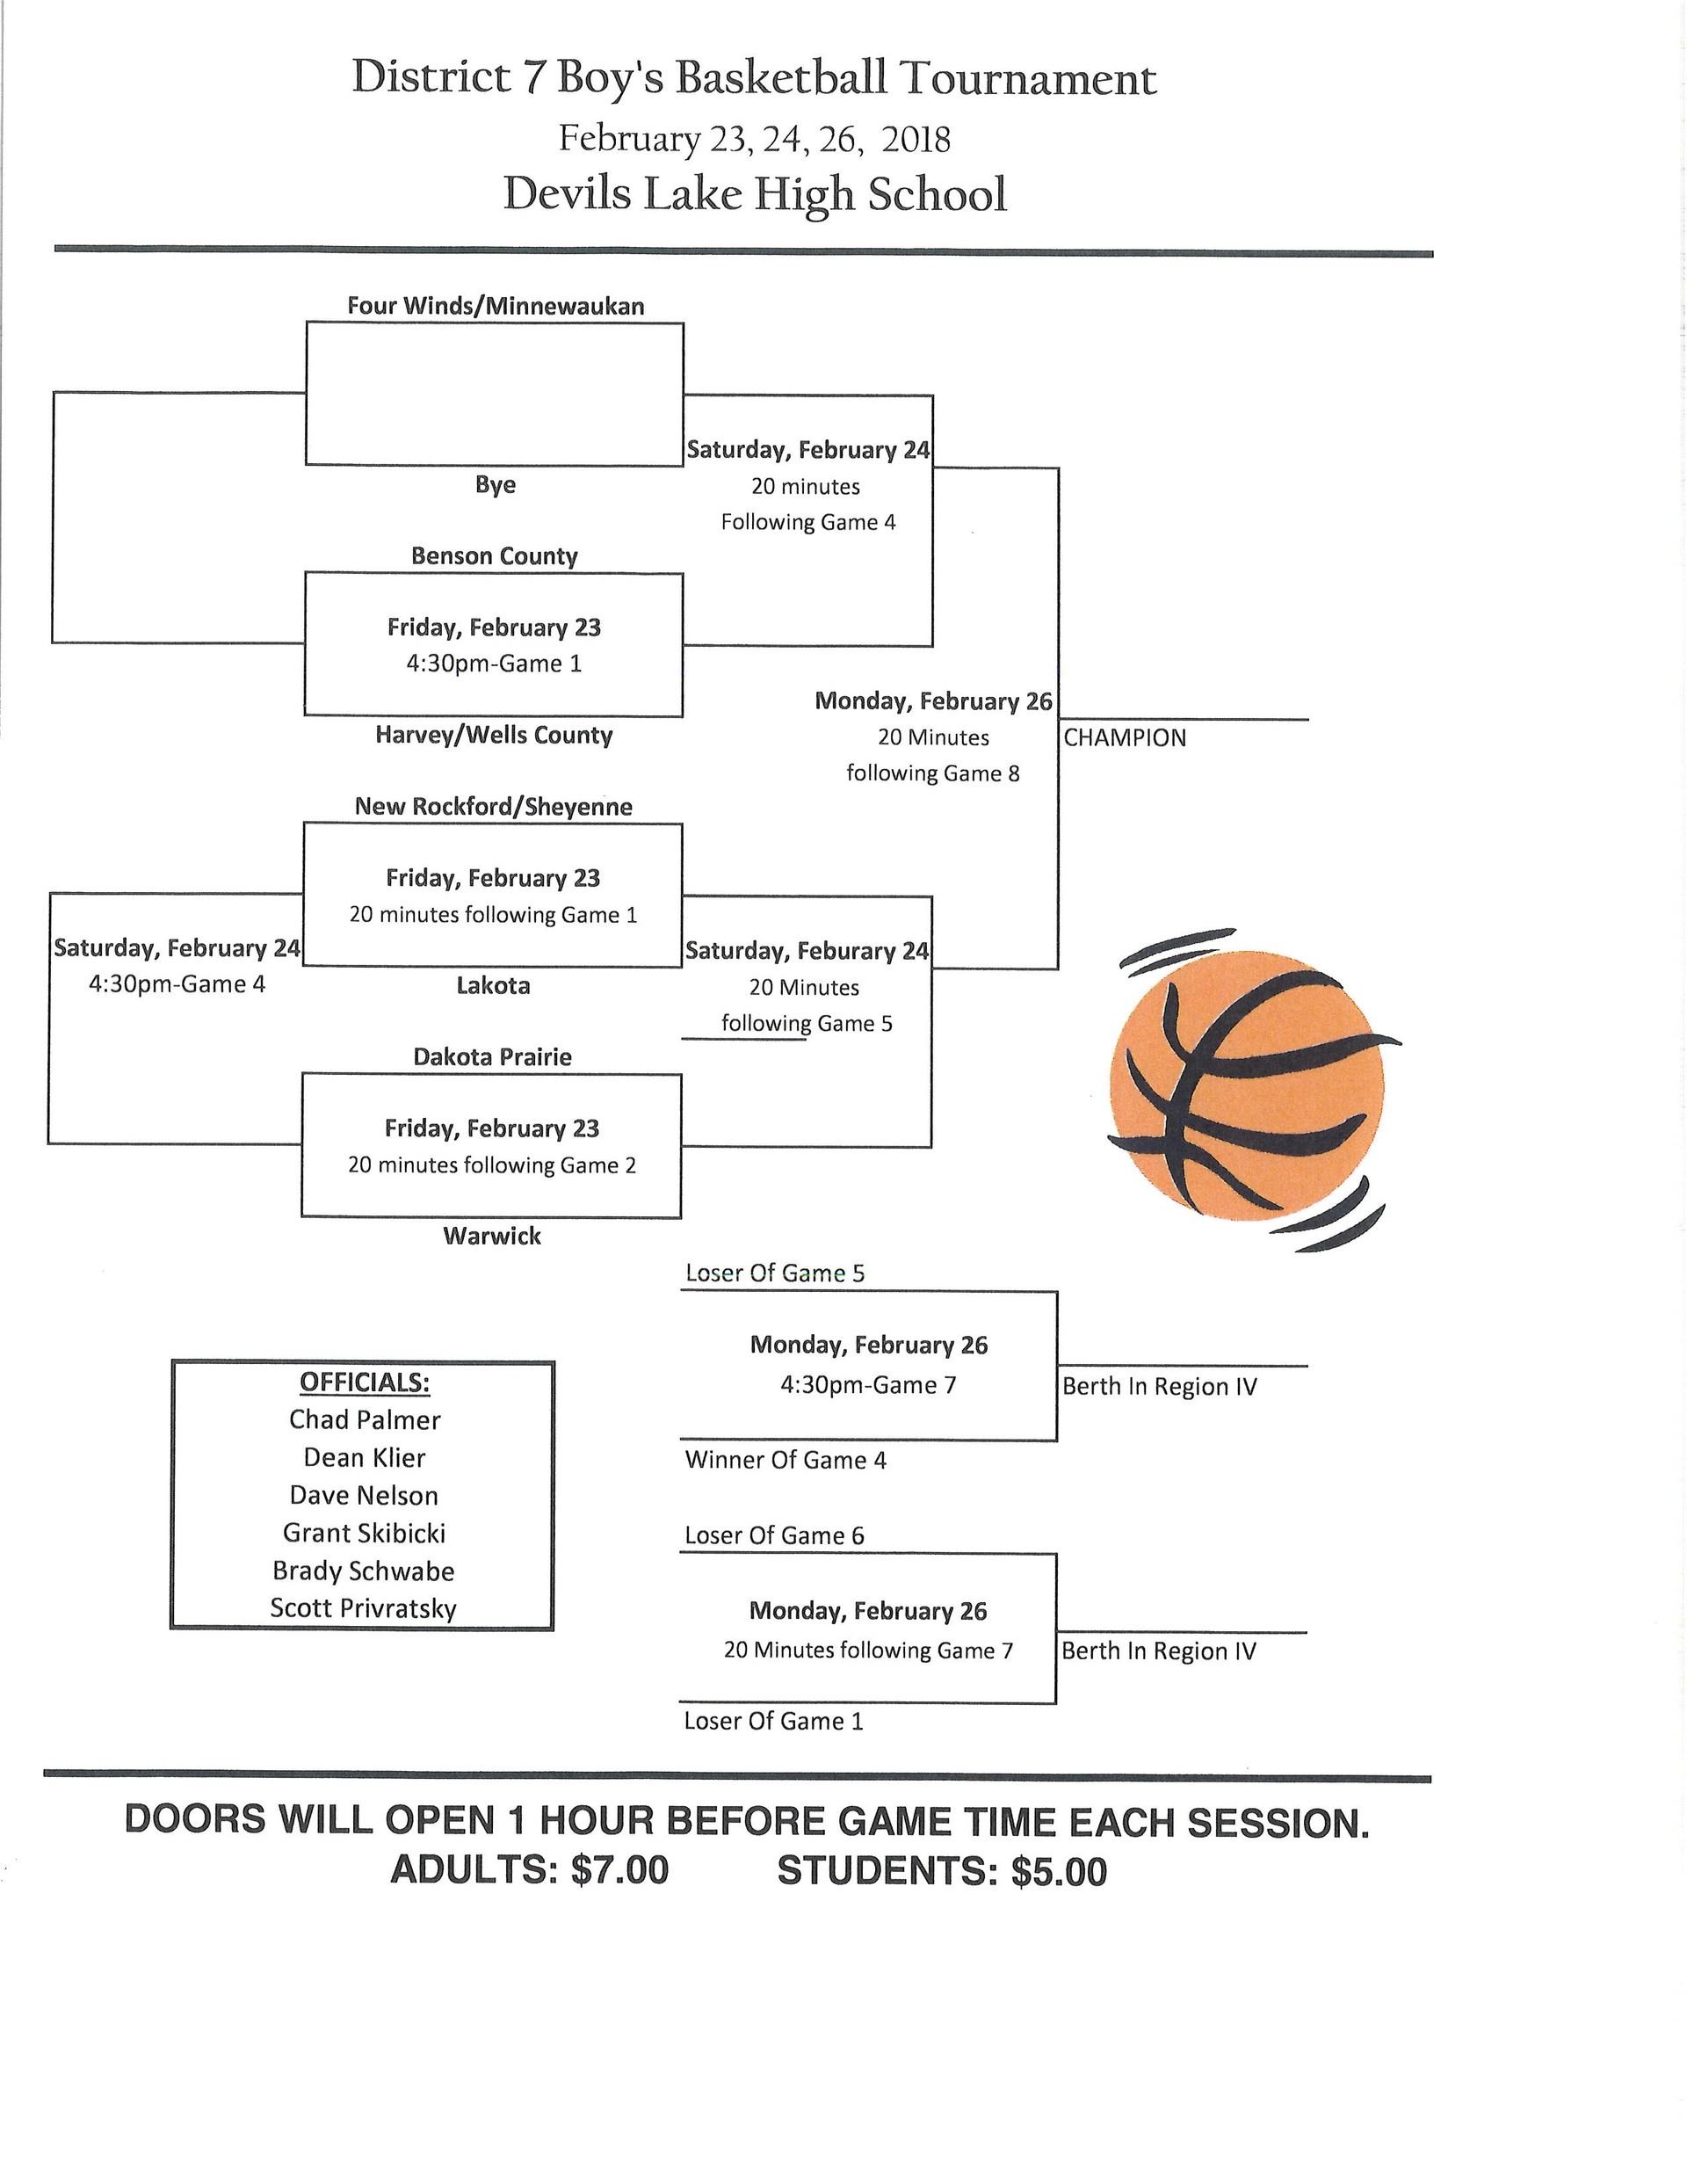 BBB District Tournament Schedule